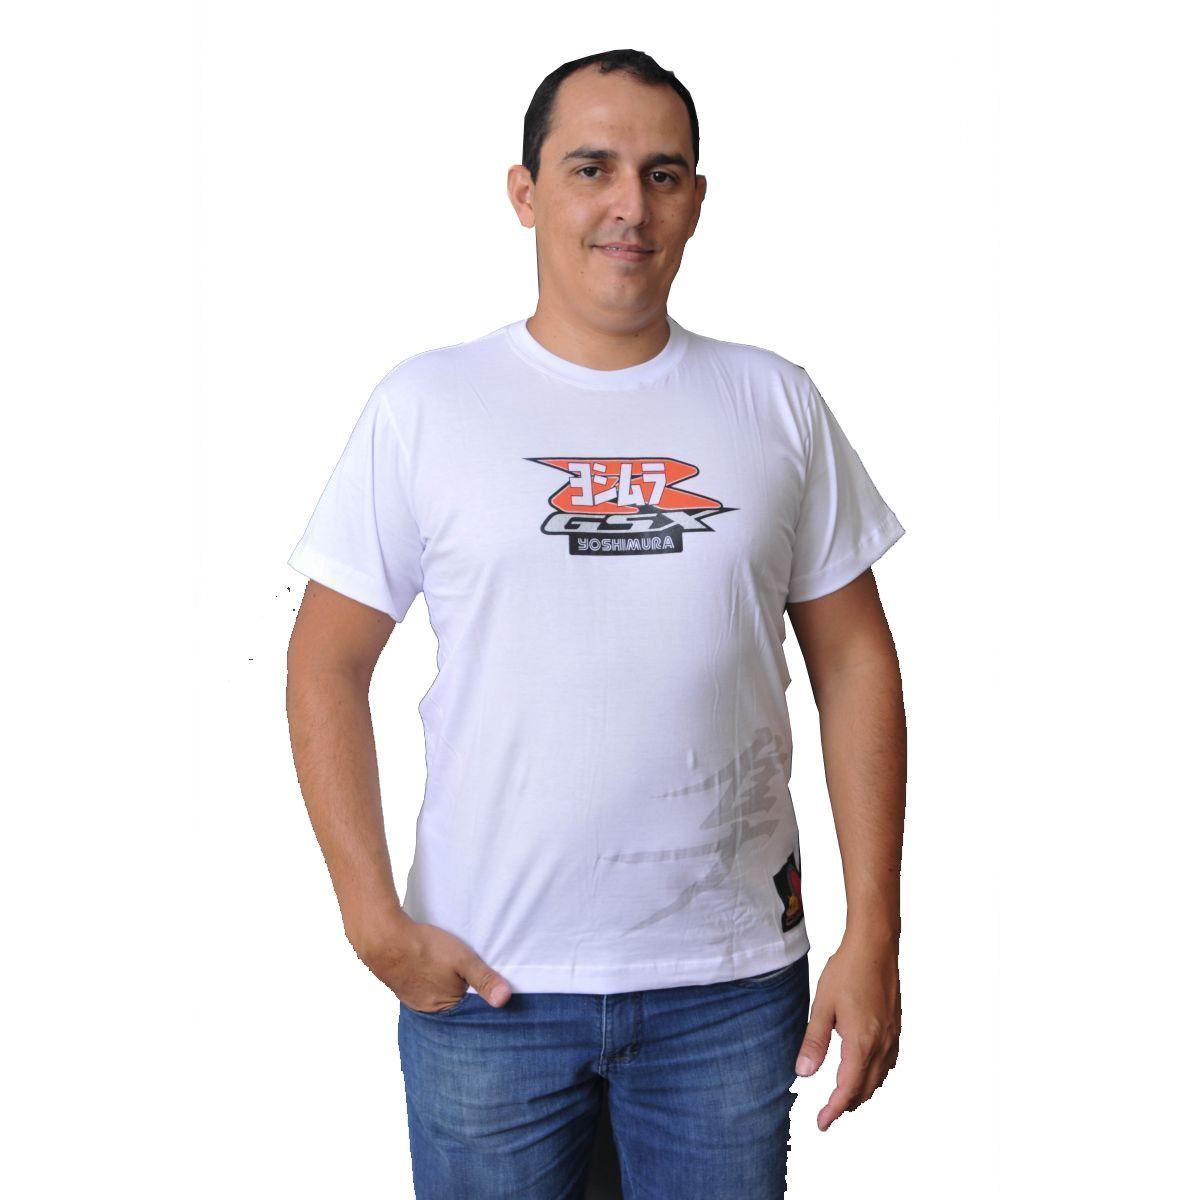 Camiseta GSX 1300R Powered